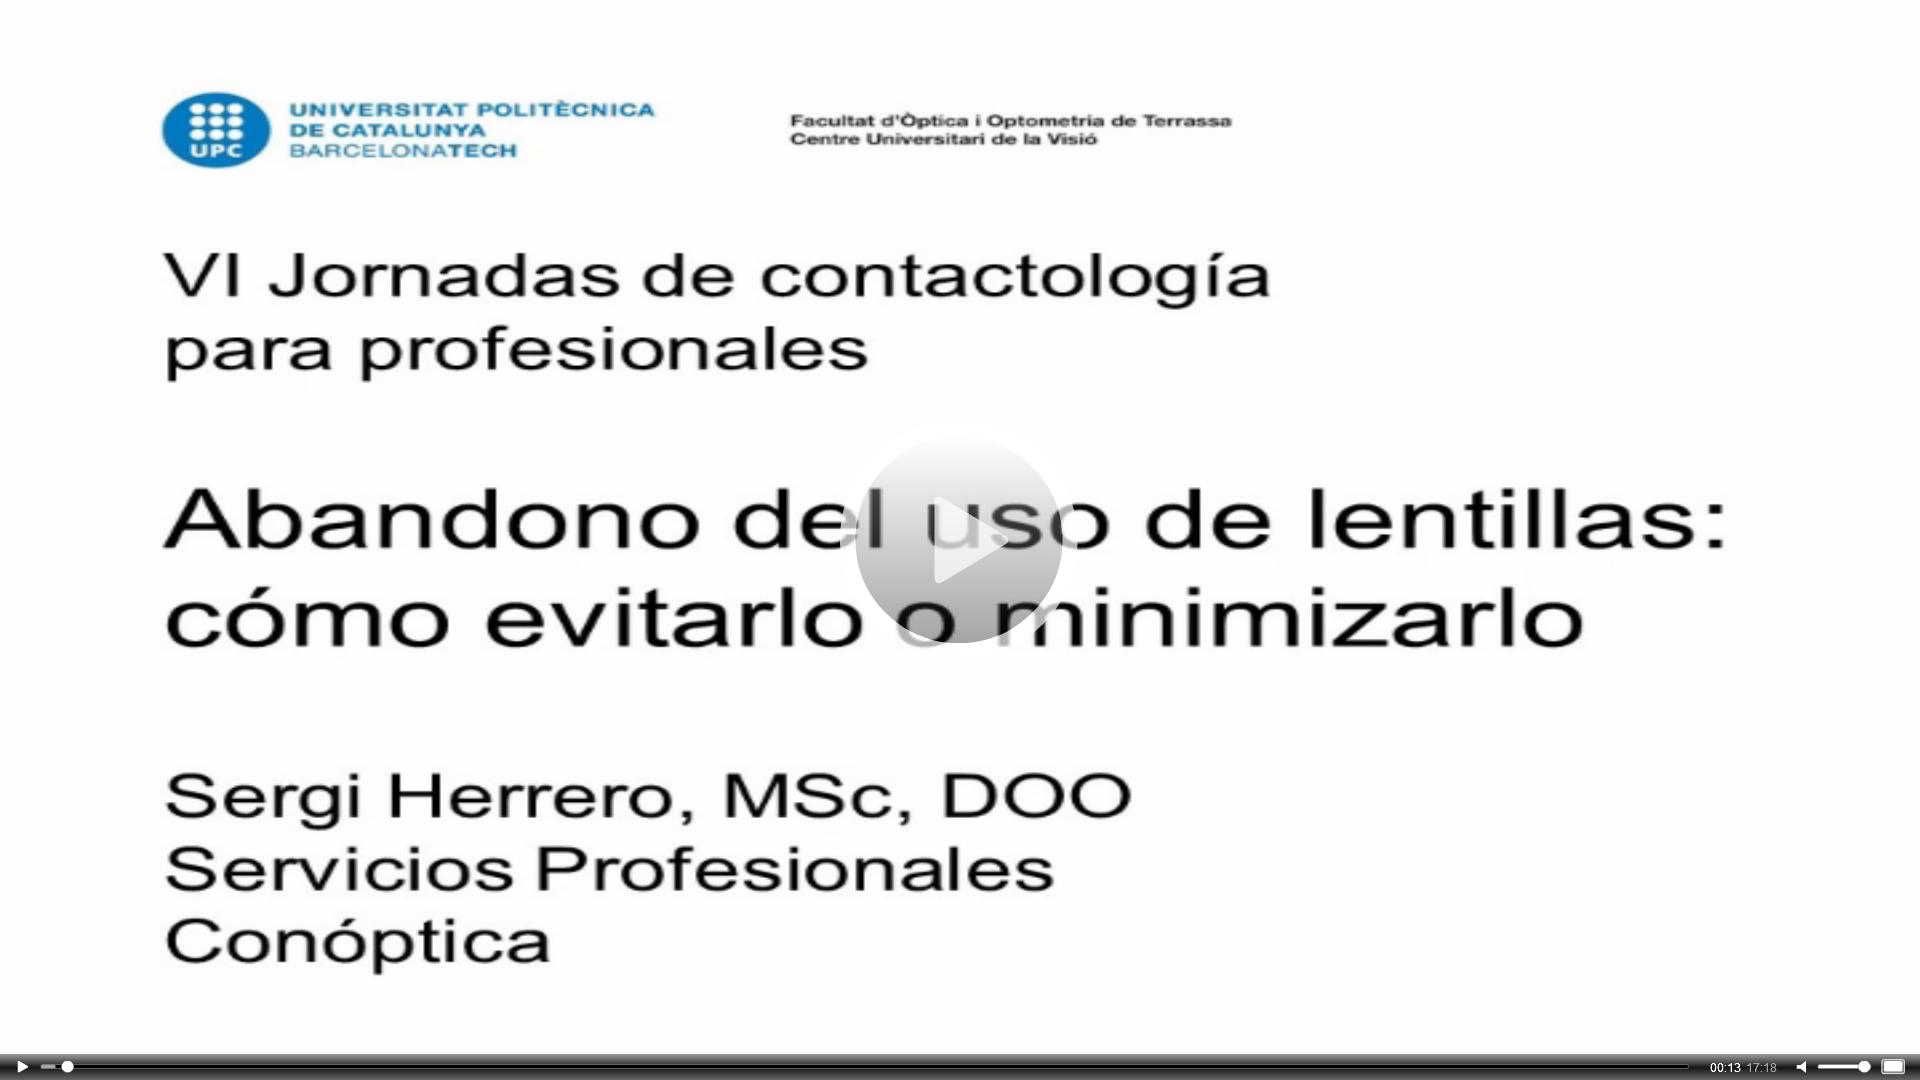 JLC2015_evitar_abandono(Sergi_Herrero-Conoptica)